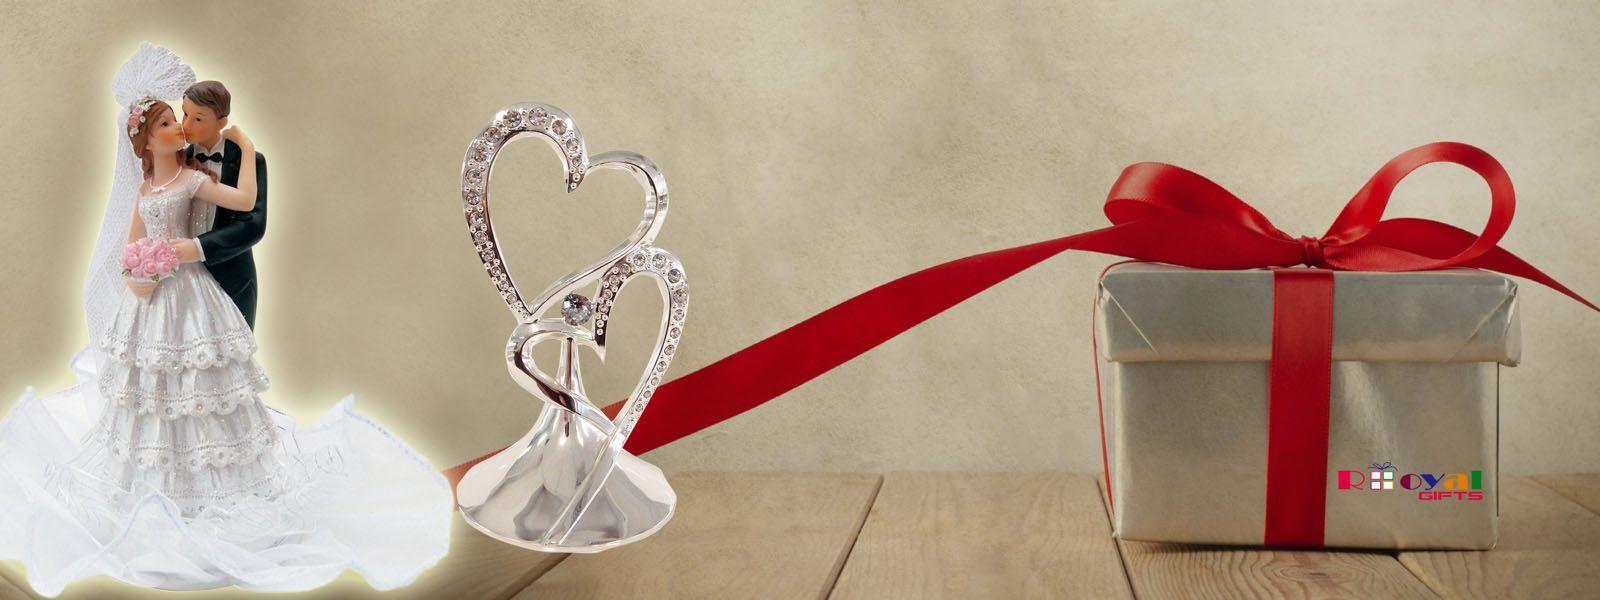 Contemporary Wedding Gifts Online Australia Ensign Wedding Dress